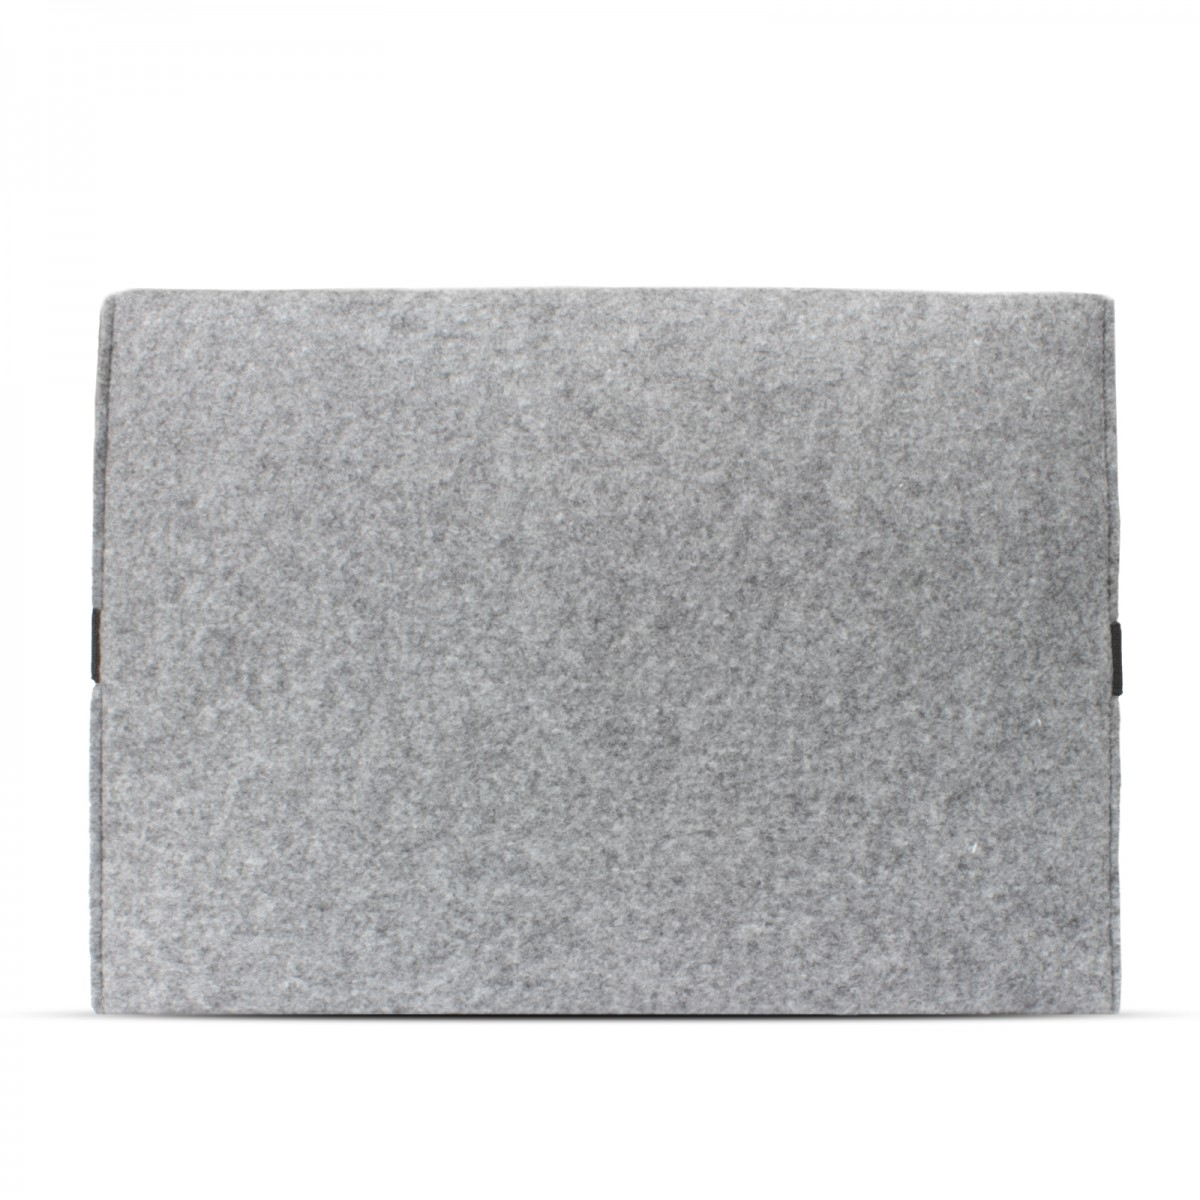 efabrikschutz h lle f r apple macbook pro 13 2016 tasche 13 3 zoll ultrabook laptop case soft. Black Bedroom Furniture Sets. Home Design Ideas